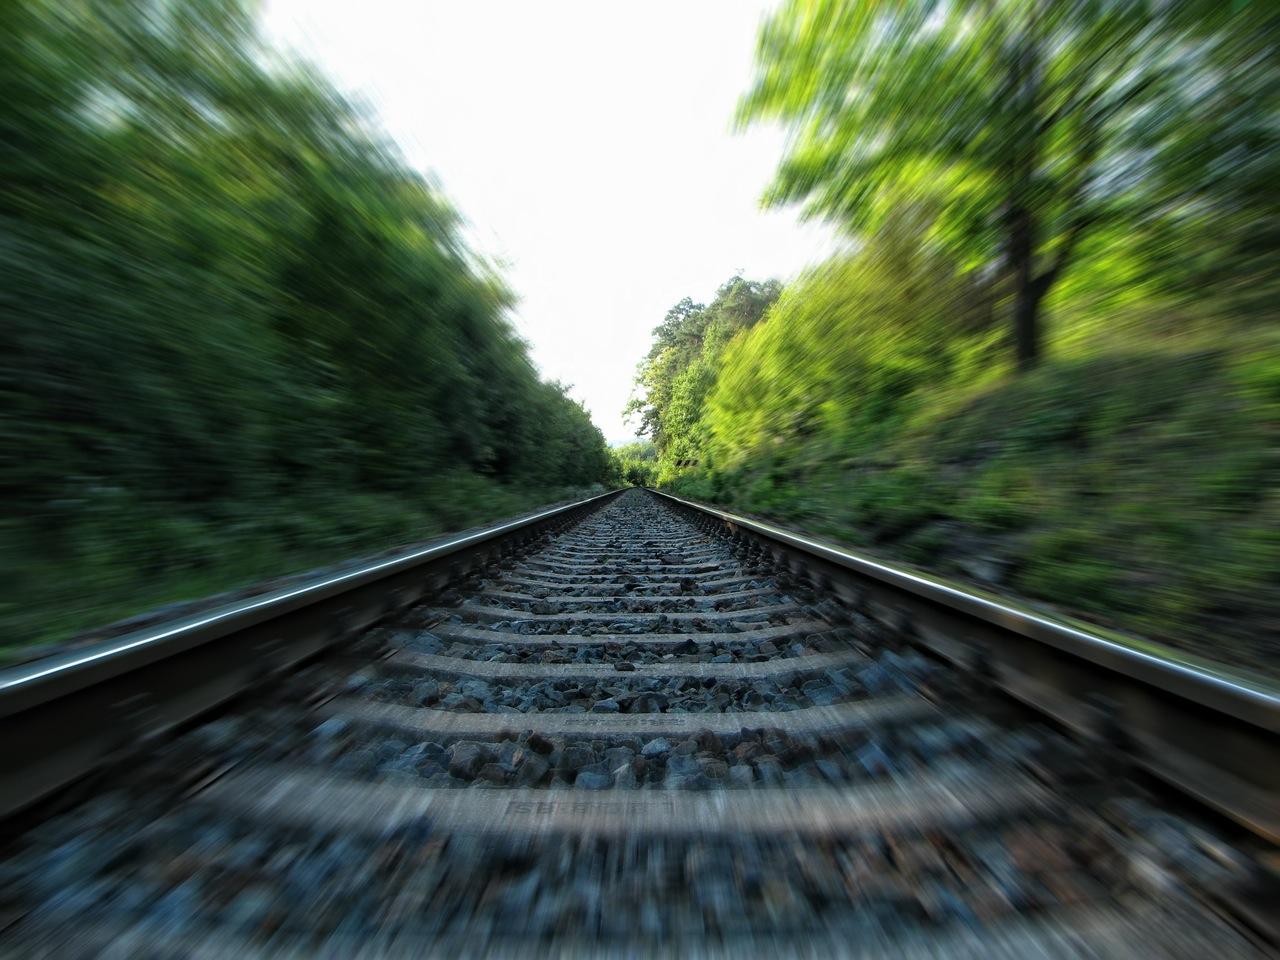 No Brakes On This Gravy Train: Always Keep Growing